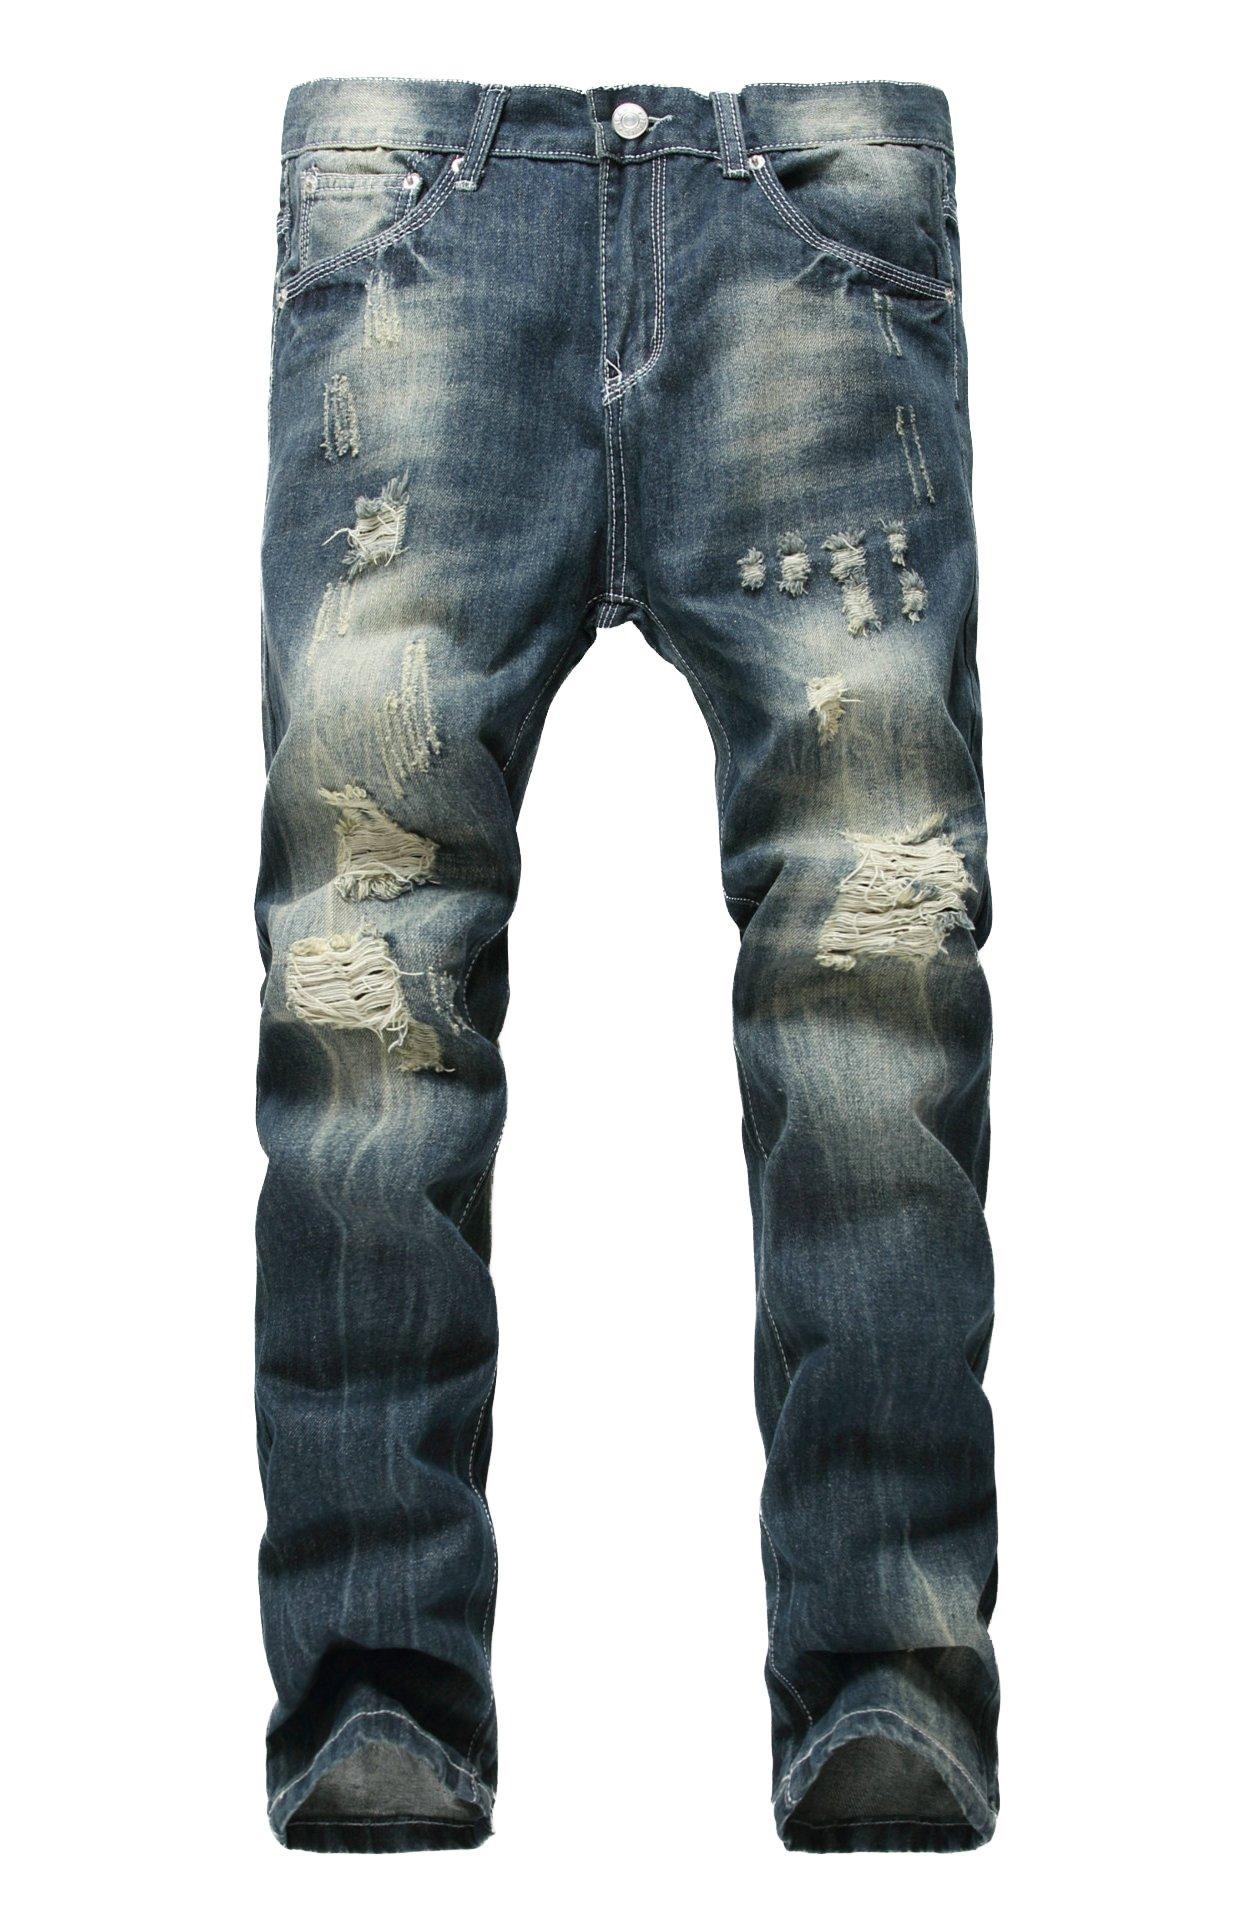 LAMCORD Men's Dark Blue Denim Ripped Slim Fit Skinny Jeans Biker Pants with Holes, W38